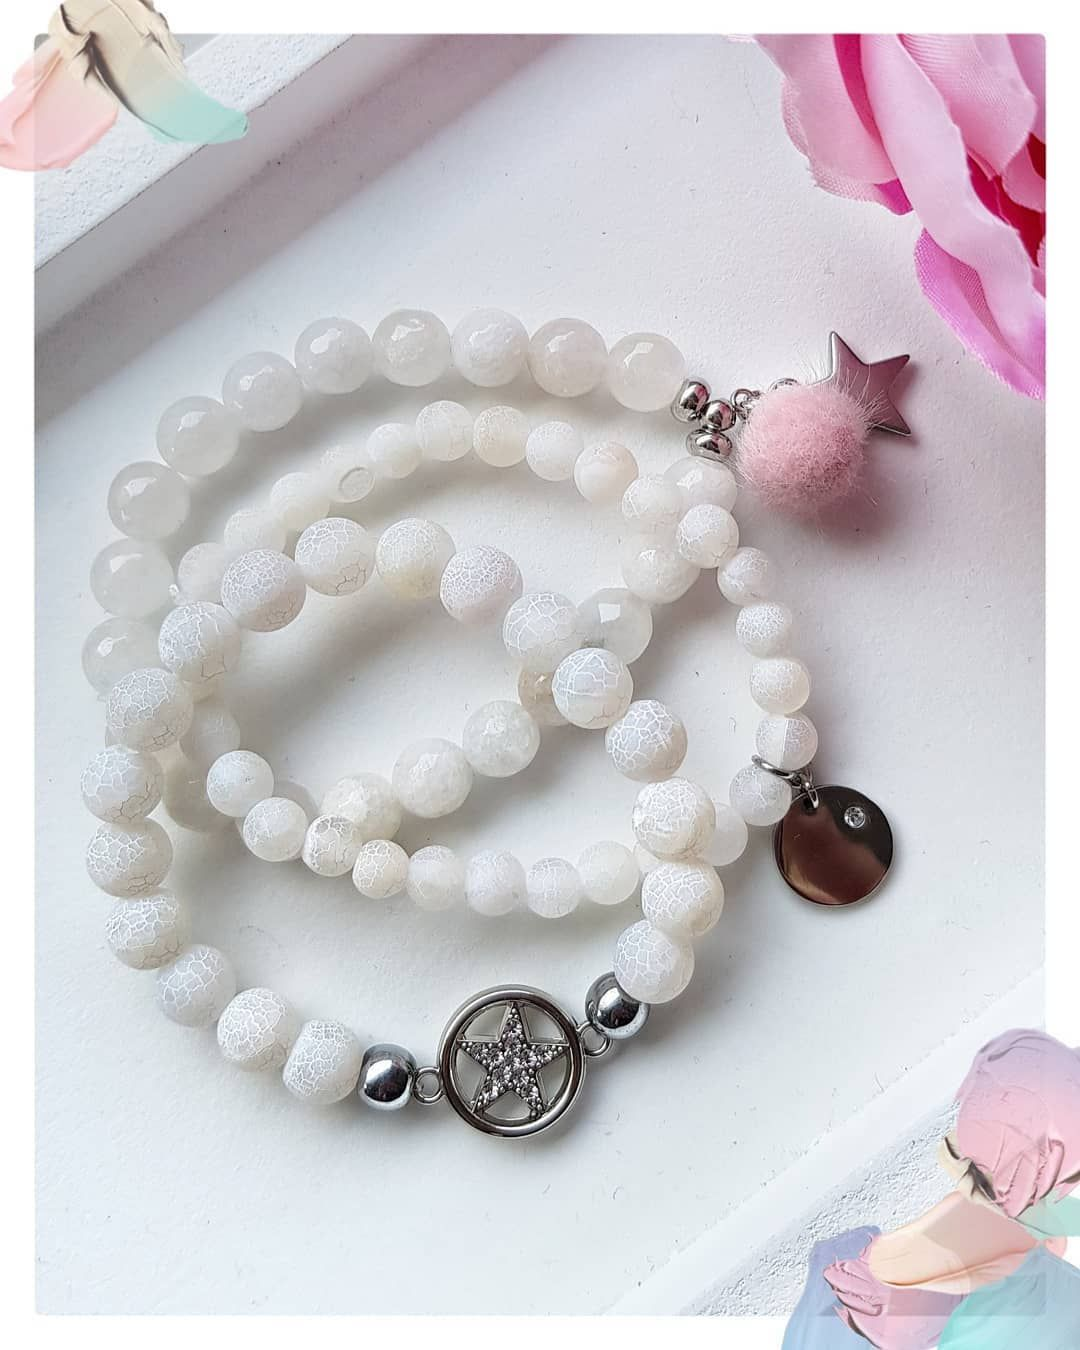 Happy Friday 💞💞💞 _____________________________________________  #mala #malanecklace #tassel #pink #pinklove #yoga #yogaphotography #yogajewelry #namaste #gemstone #om #buddha #thinkpink #mommyblogger #momlife #yogamom #businessmom #accessories #jewelryinspo #jewelrydesign #motivation #diy #hamsahand #instagood #jotd #ootd